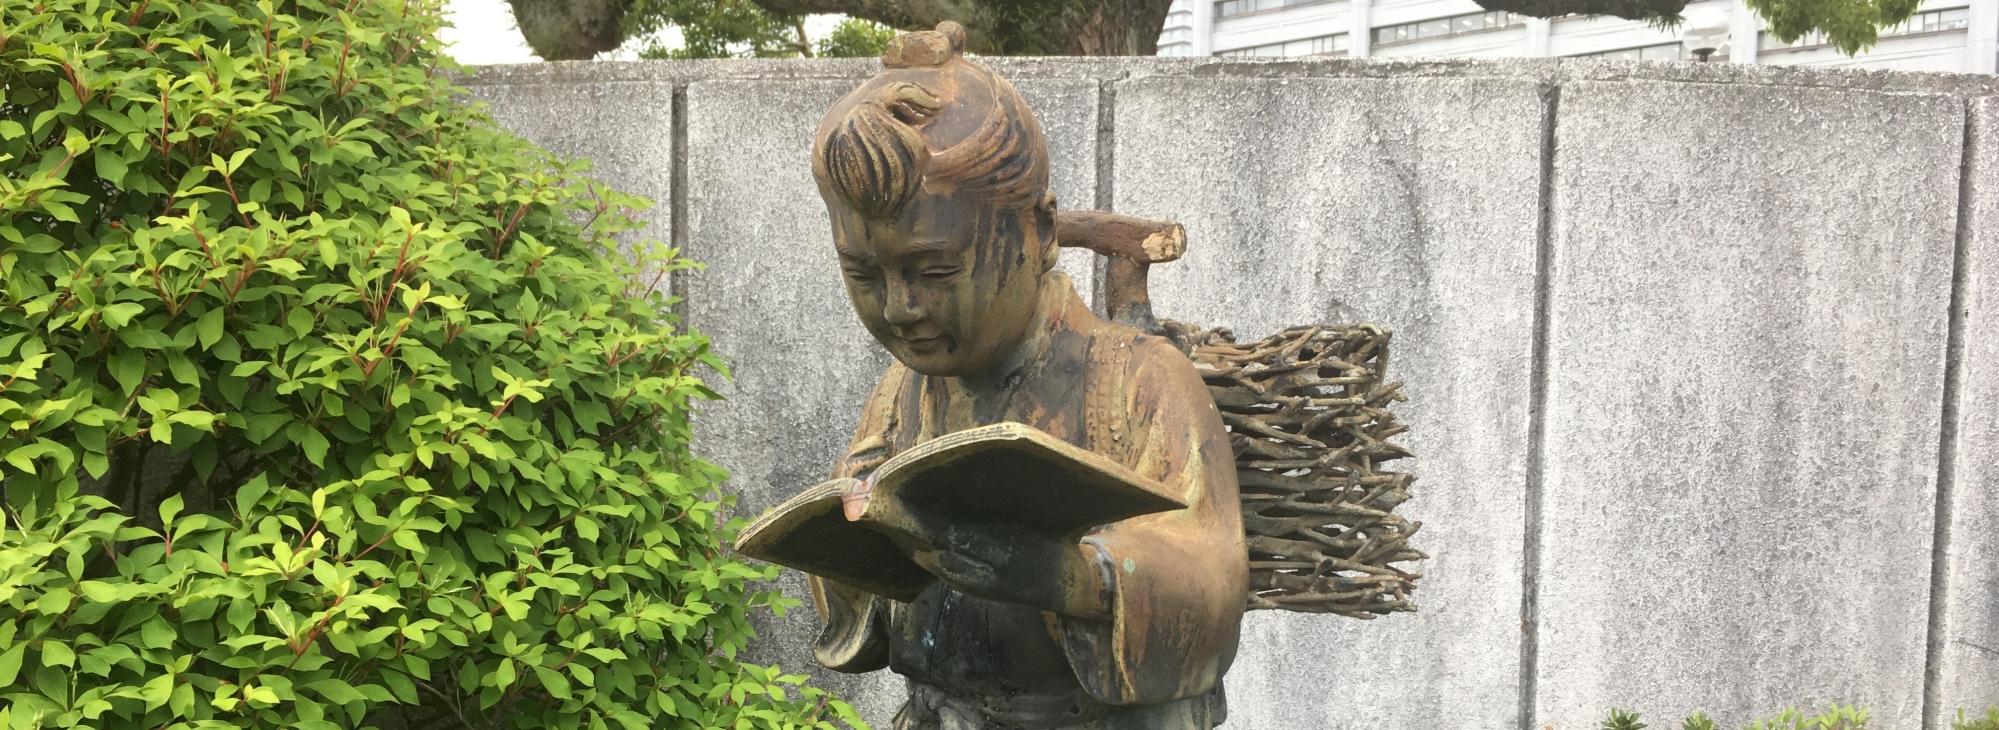 Ninomiya Kinjiro